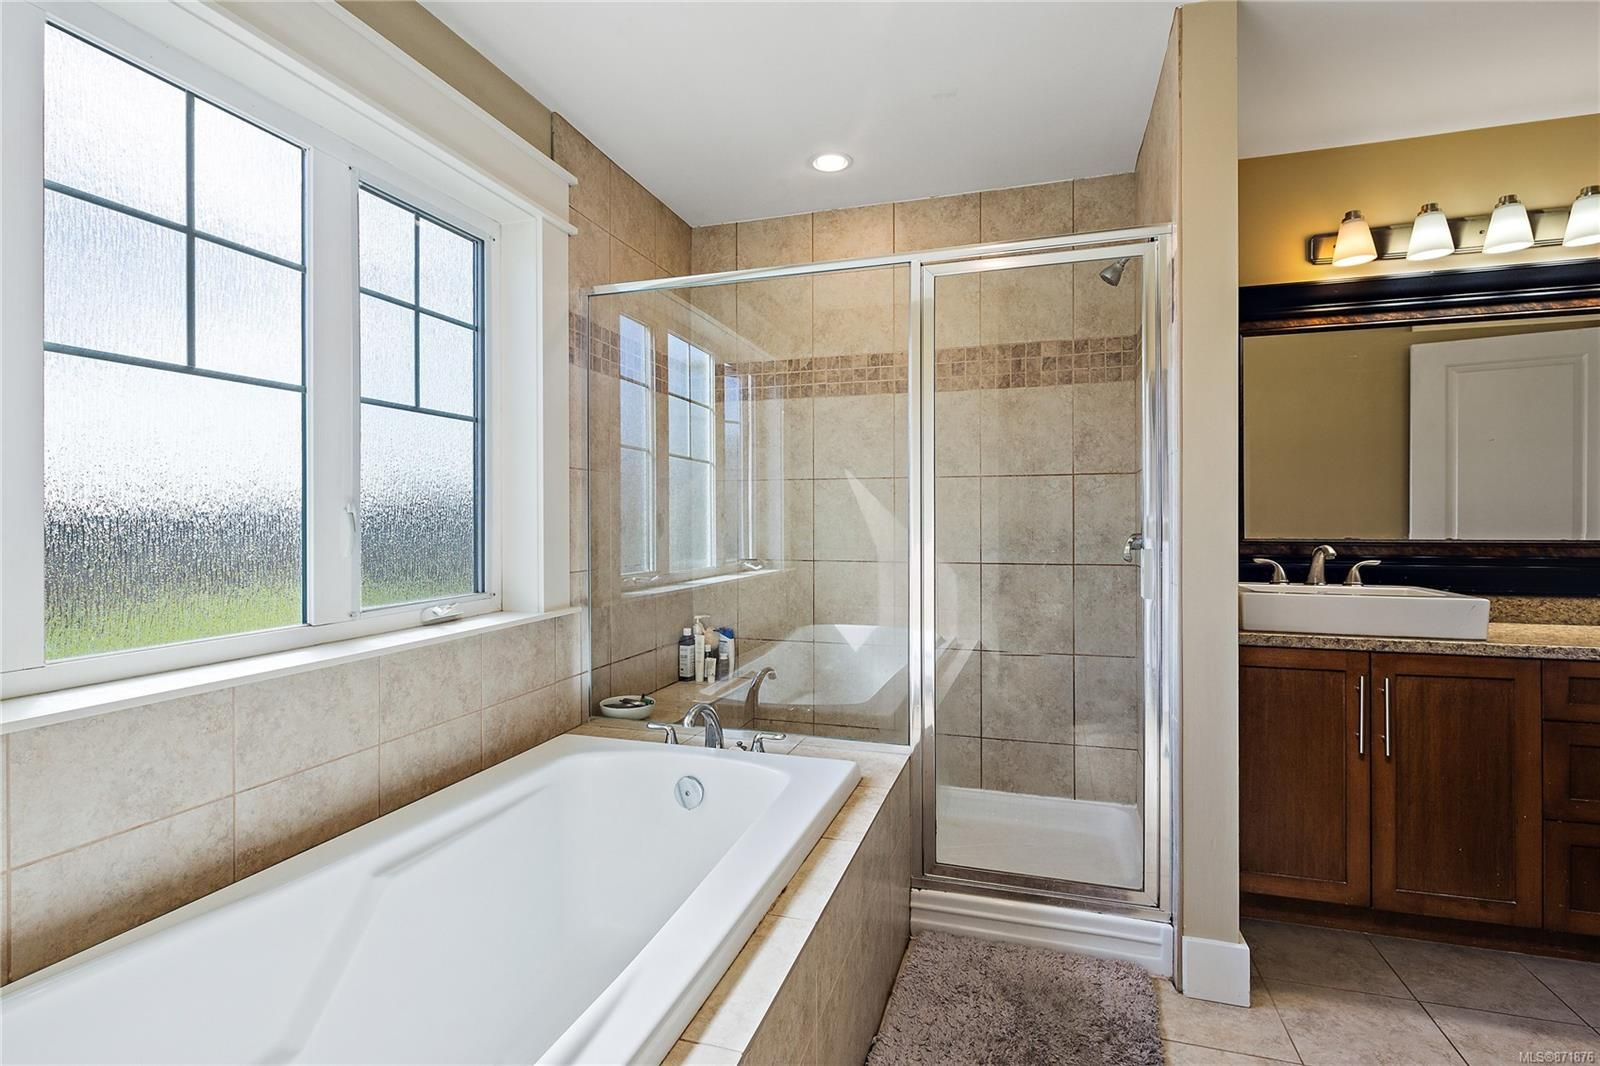 Photo 33: Photos: 4420 Wilkinson Rd in : SW Royal Oak House for sale (Saanich West)  : MLS®# 871876